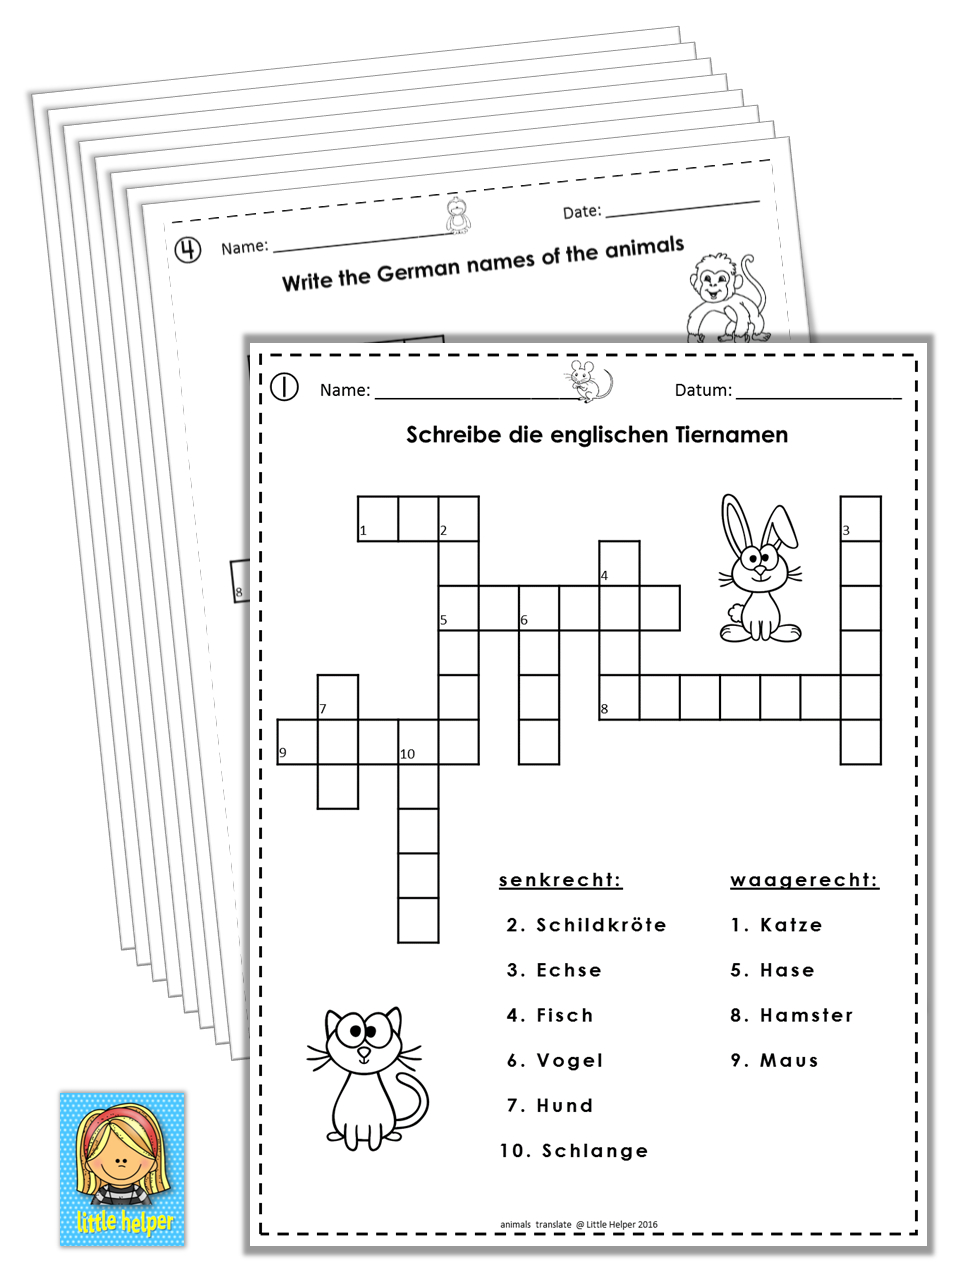 German/english Crossword Puzzles Tiere/animals | German Words - Zoo Crossword Puzzle Printable